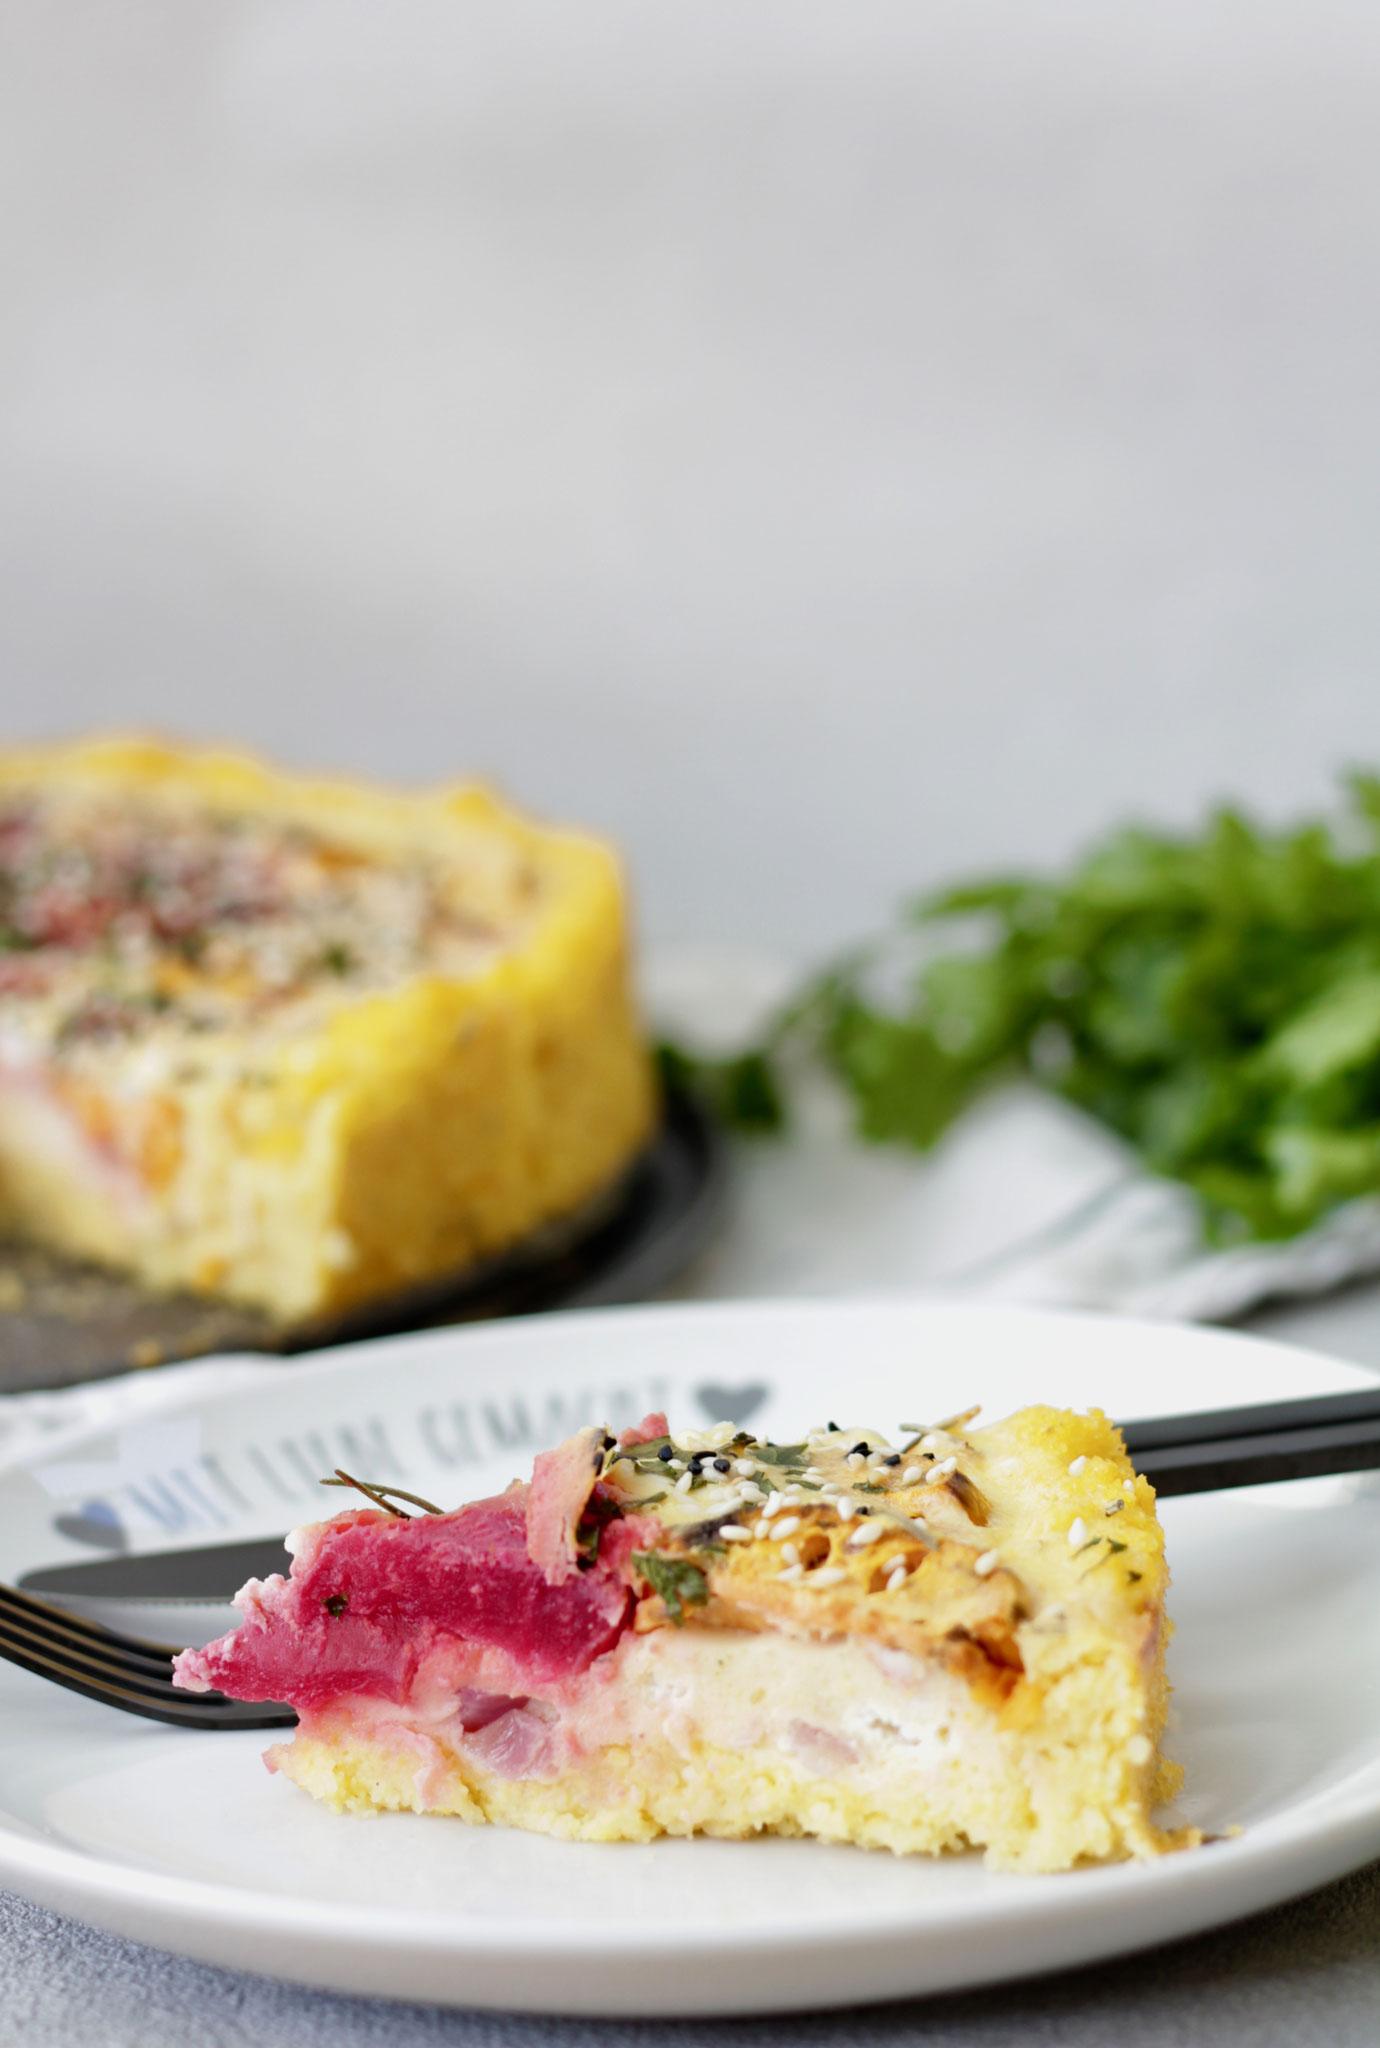 Kürbis-Polenta-Tarte mit Ziegenfrischkäse